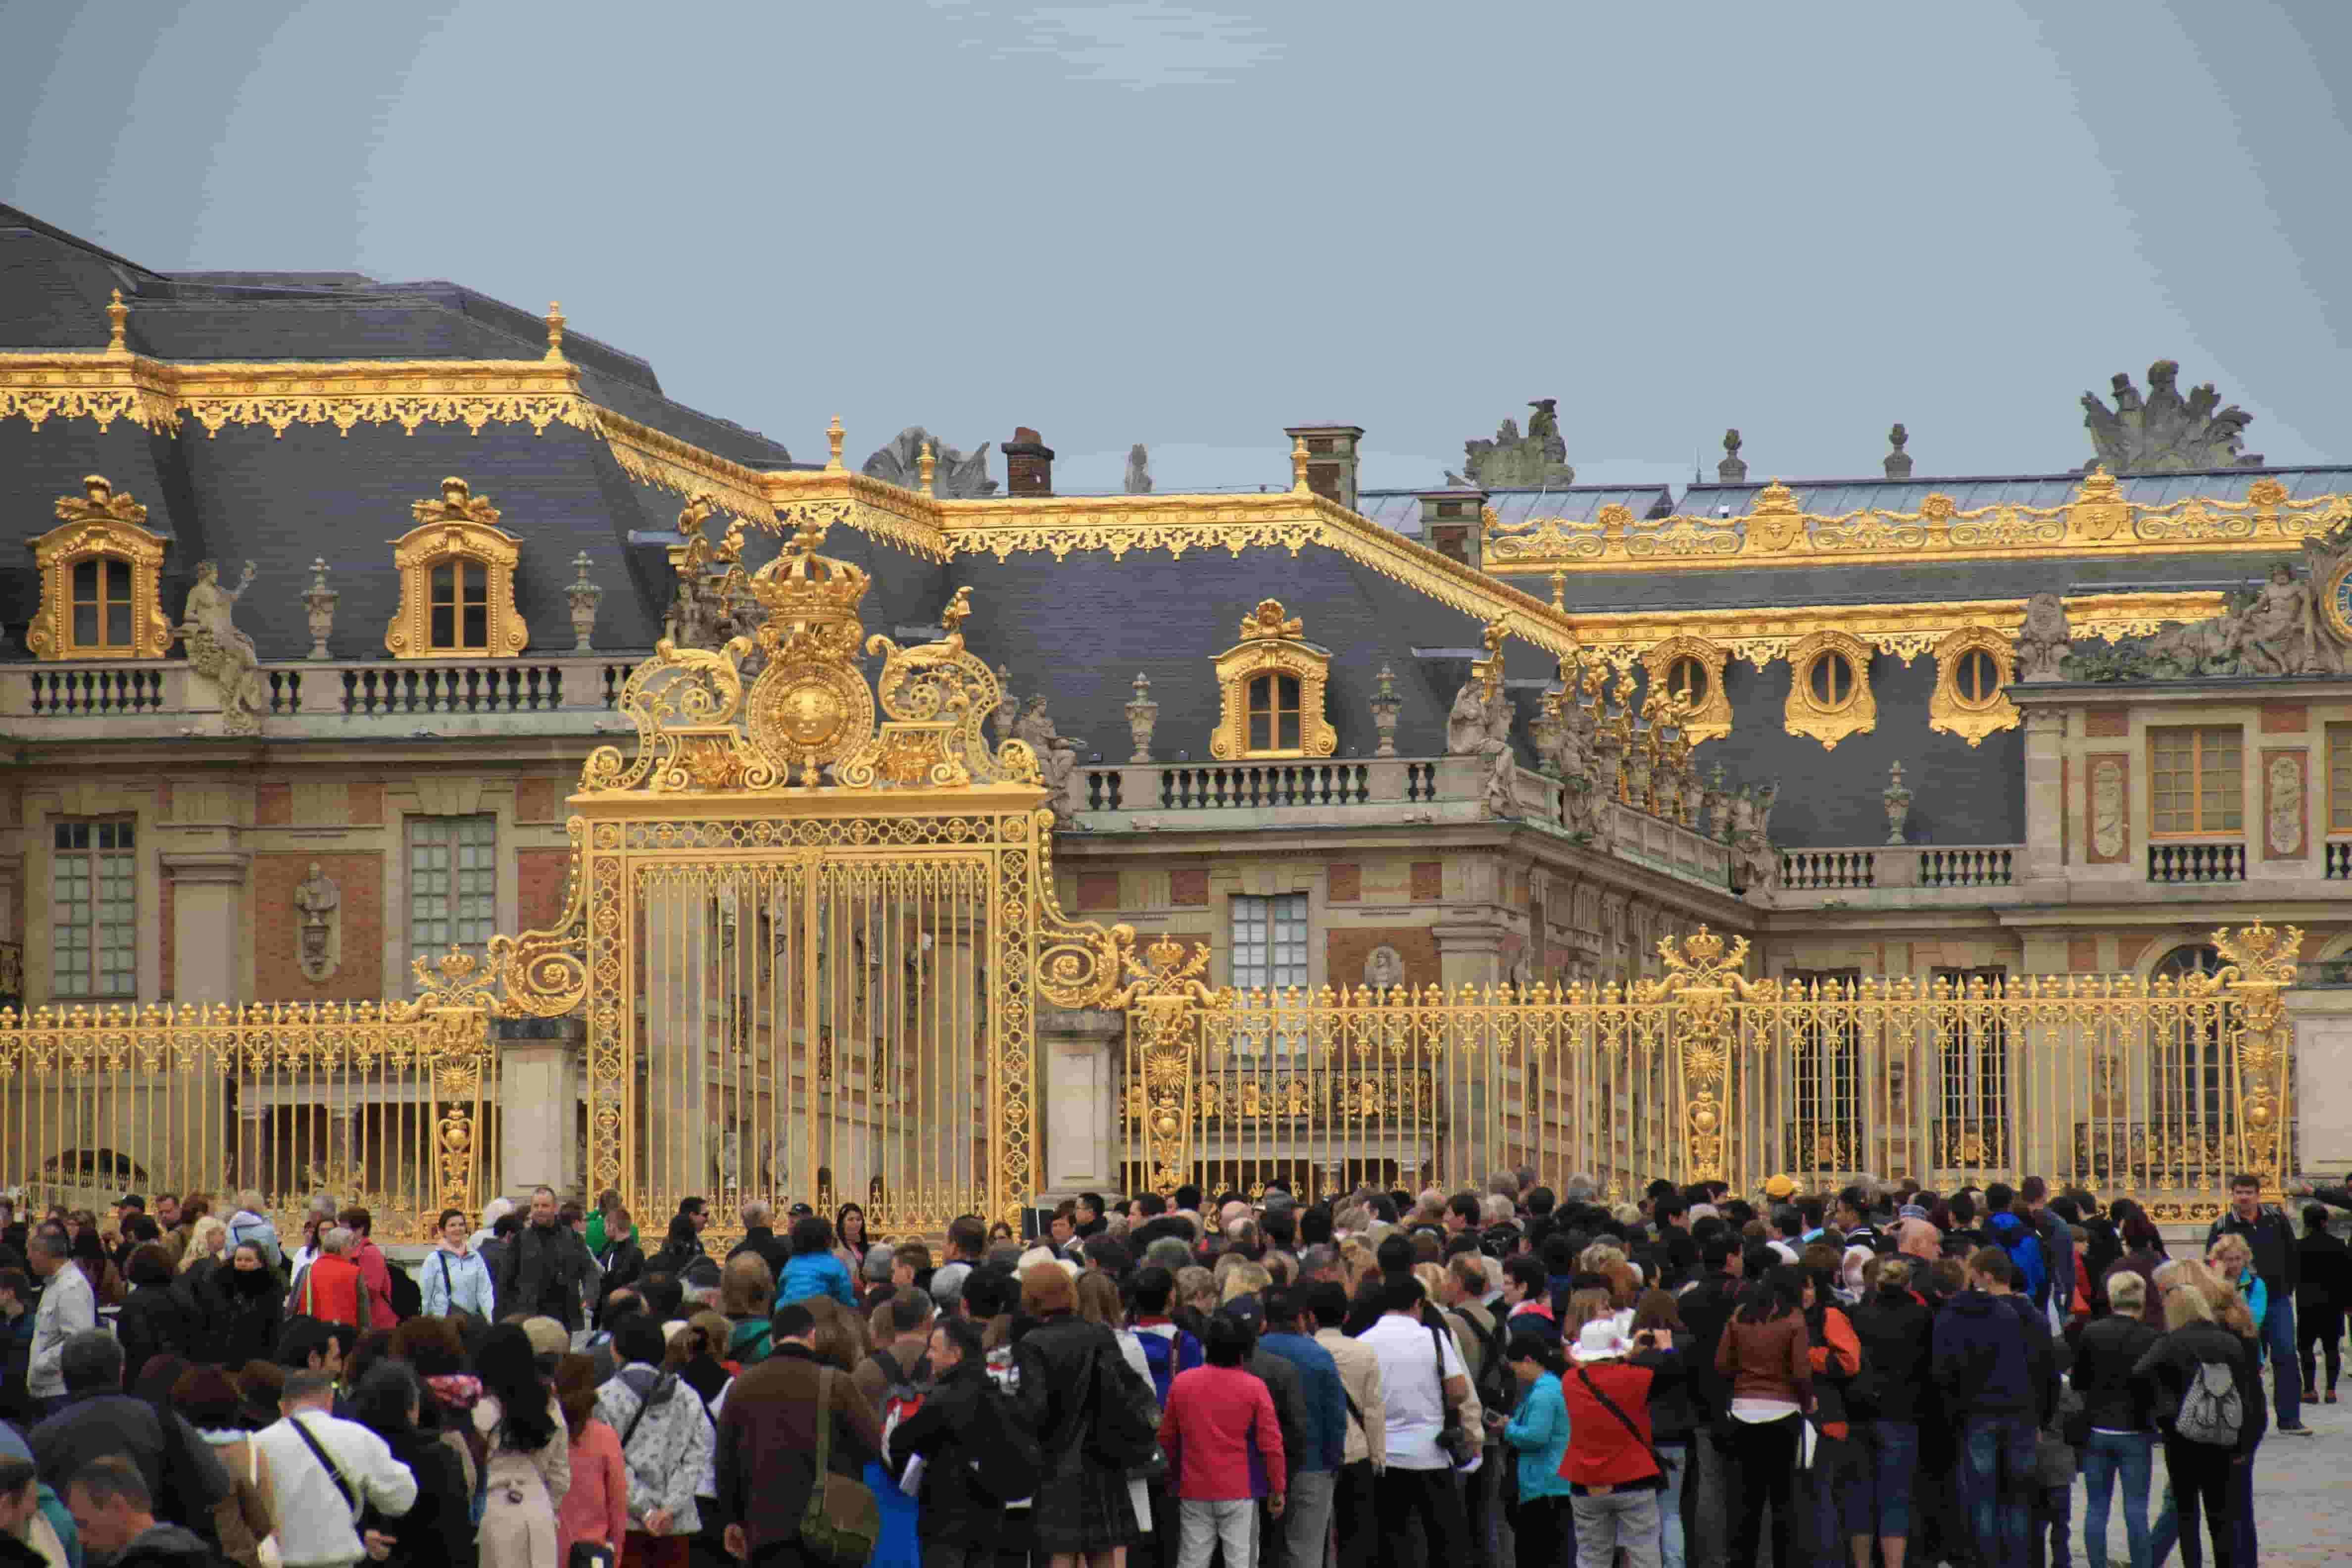 Palácio de Versalhes - Bilhetes Palácio de Versalhes